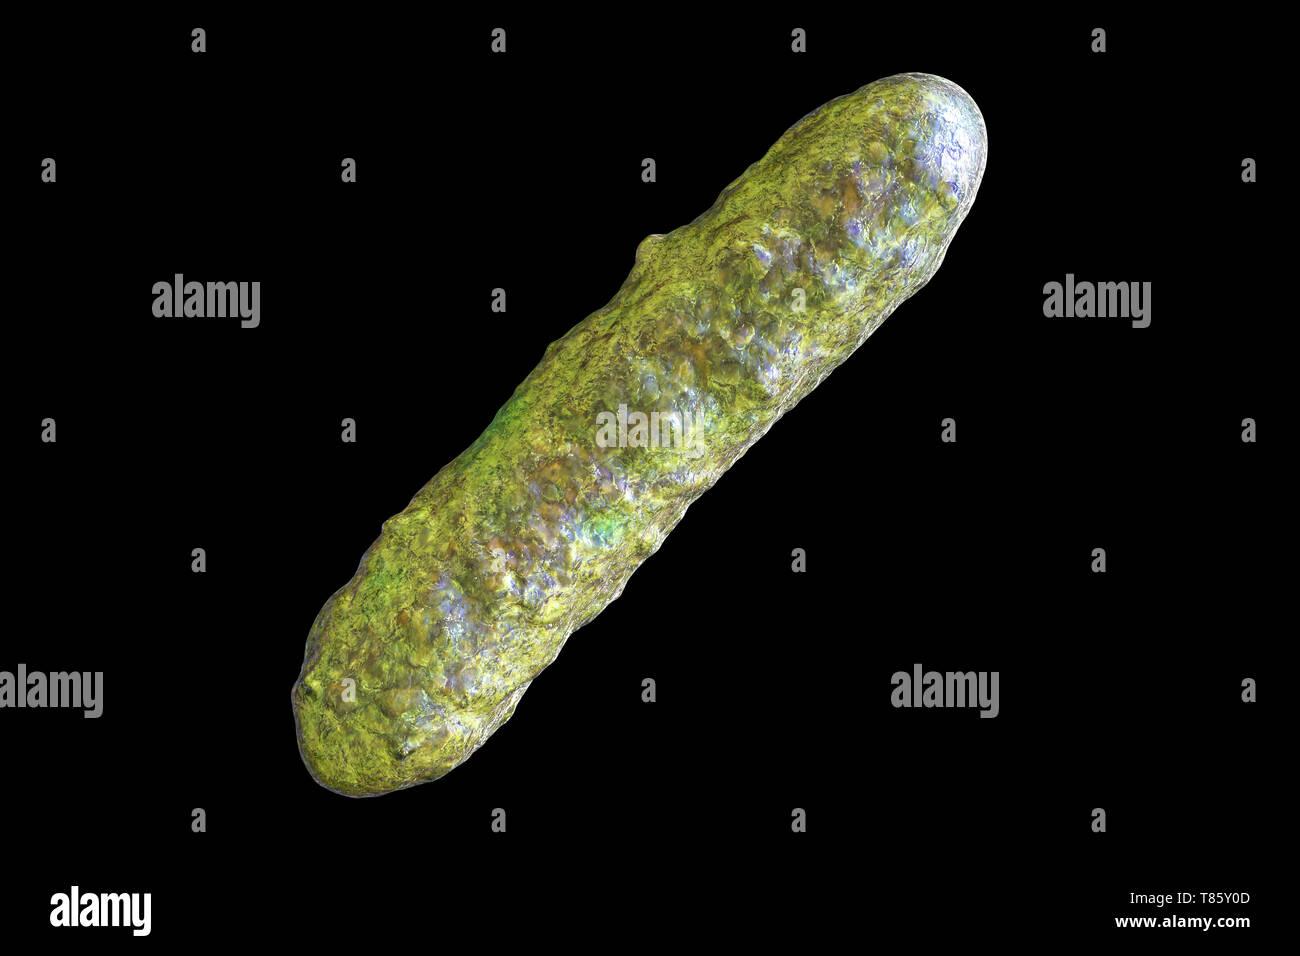 Bakterium, Abbildung Stockbild